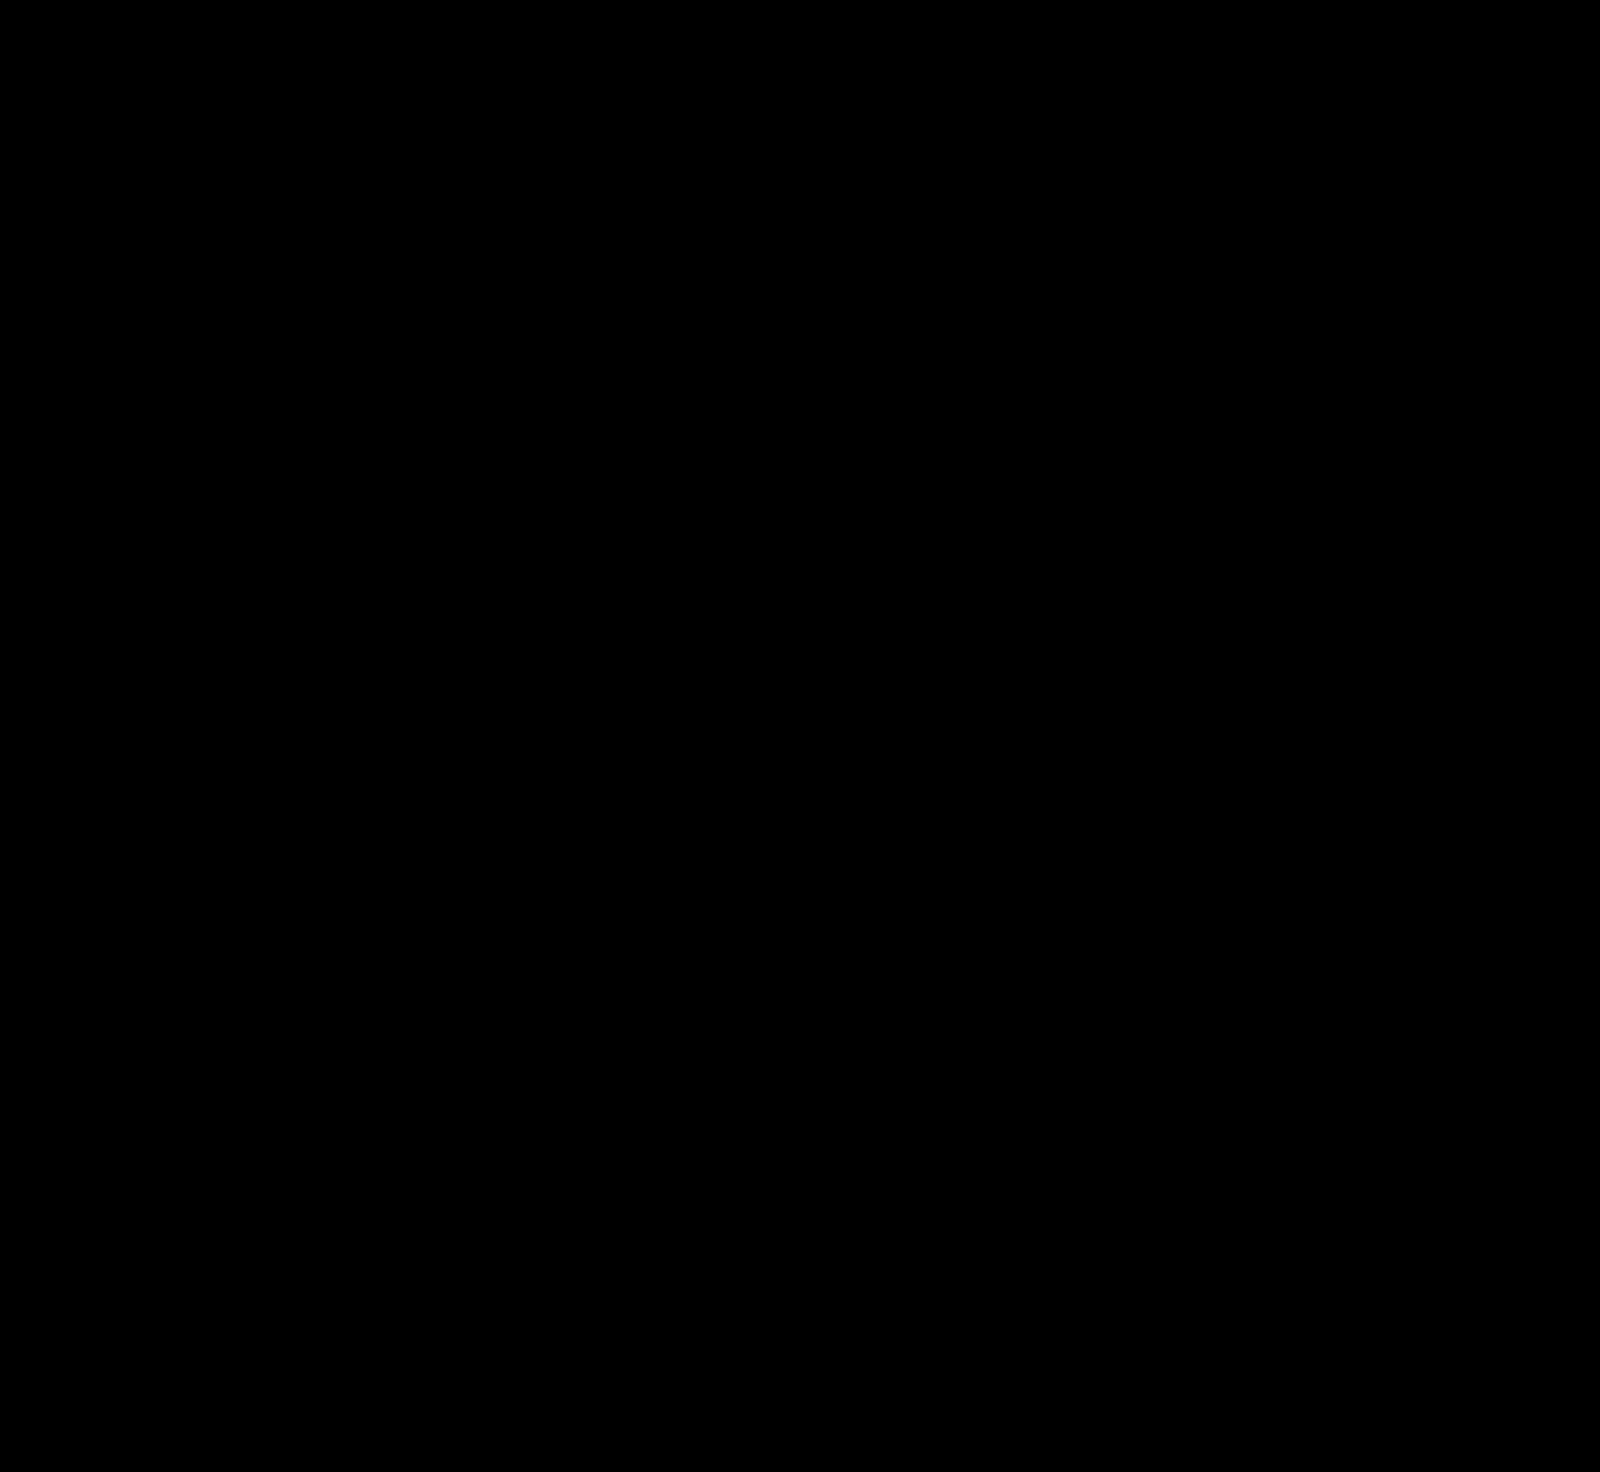 Medium Film Tripod Lamp